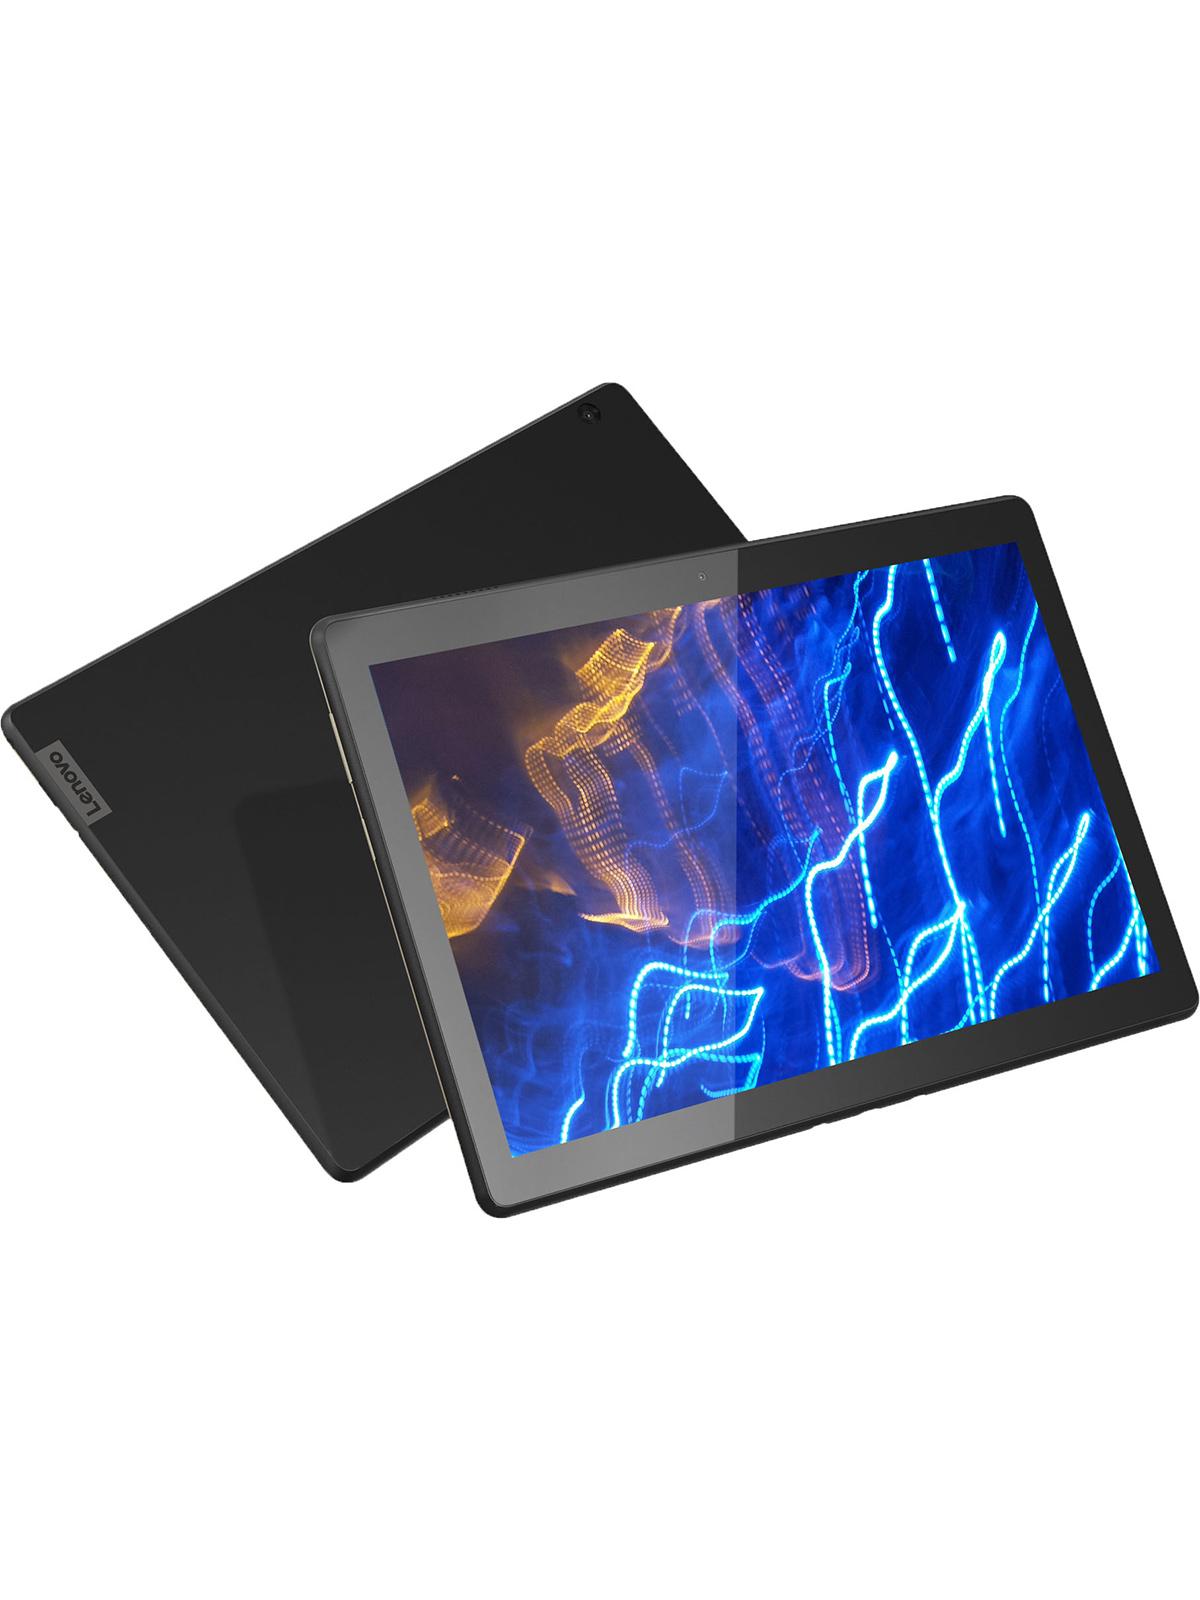 Lenovo M10 10.1in 16GB HD Tablet - Slate Black - £76 @ ElekDirect